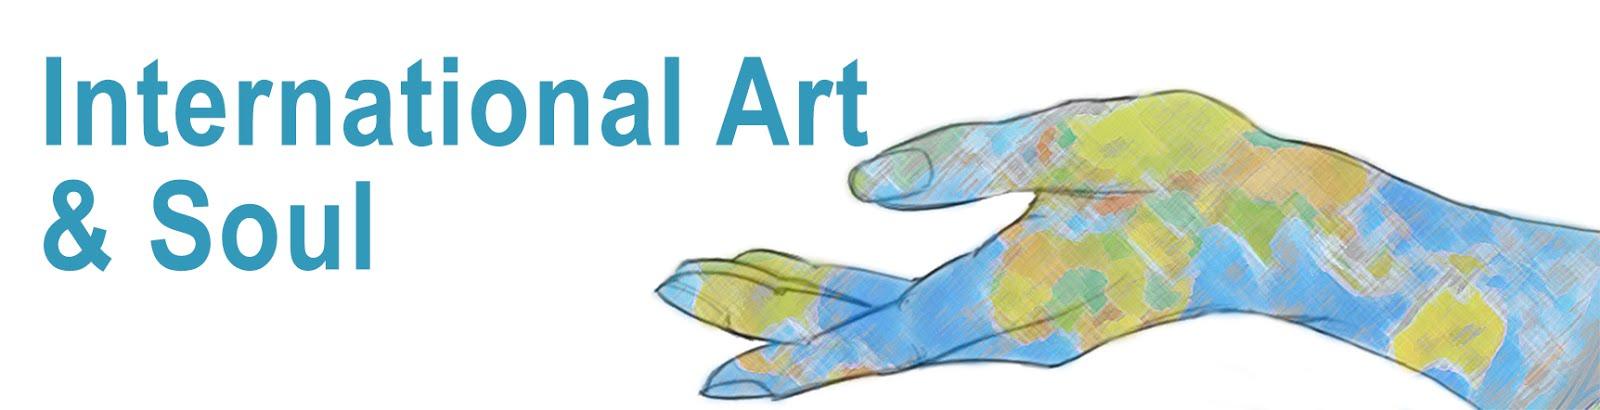 International Art & Soul